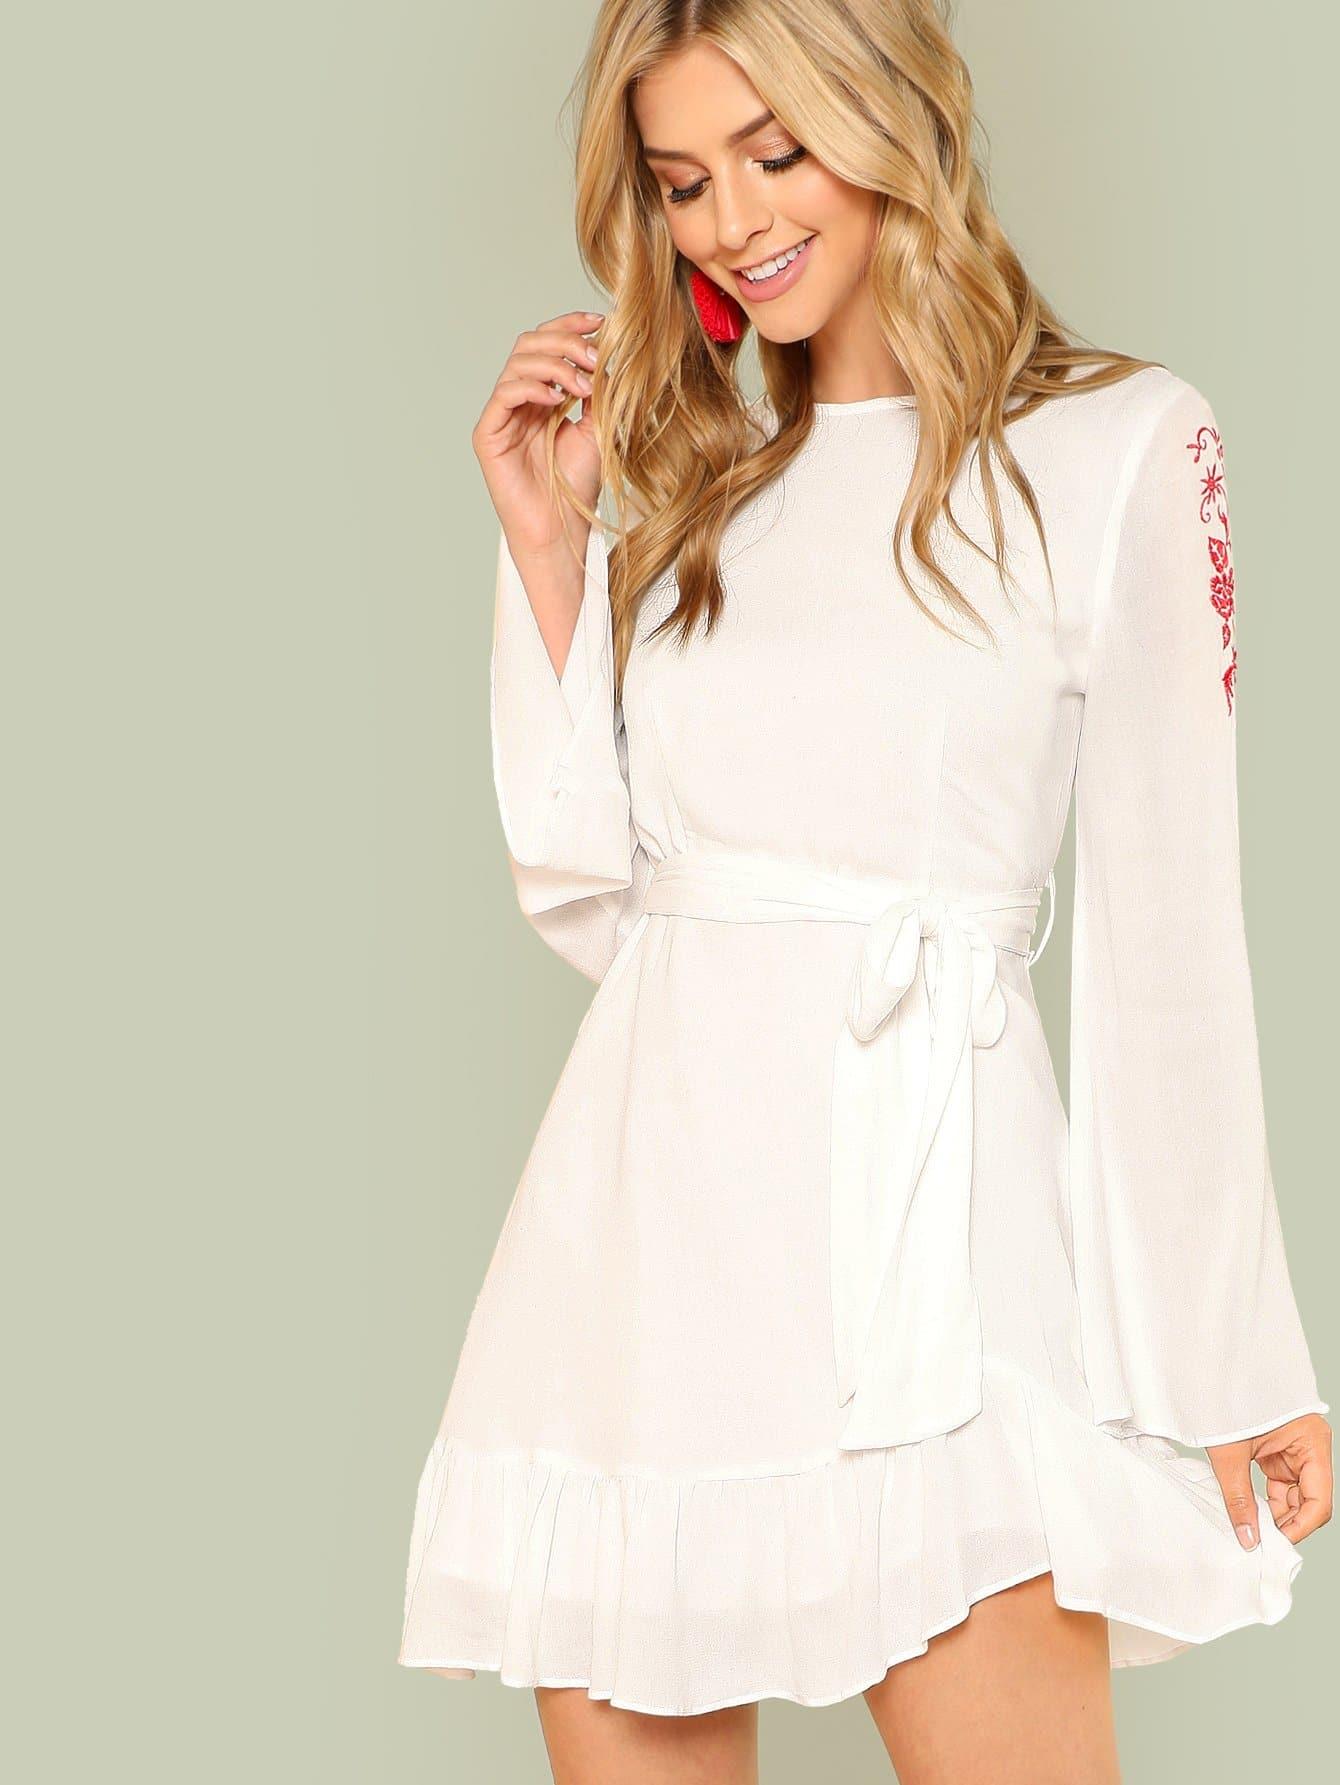 Ruffle Hem Embroidered Dress with Belt ruffle waist zip back scallop hem embroidered gingham skirt